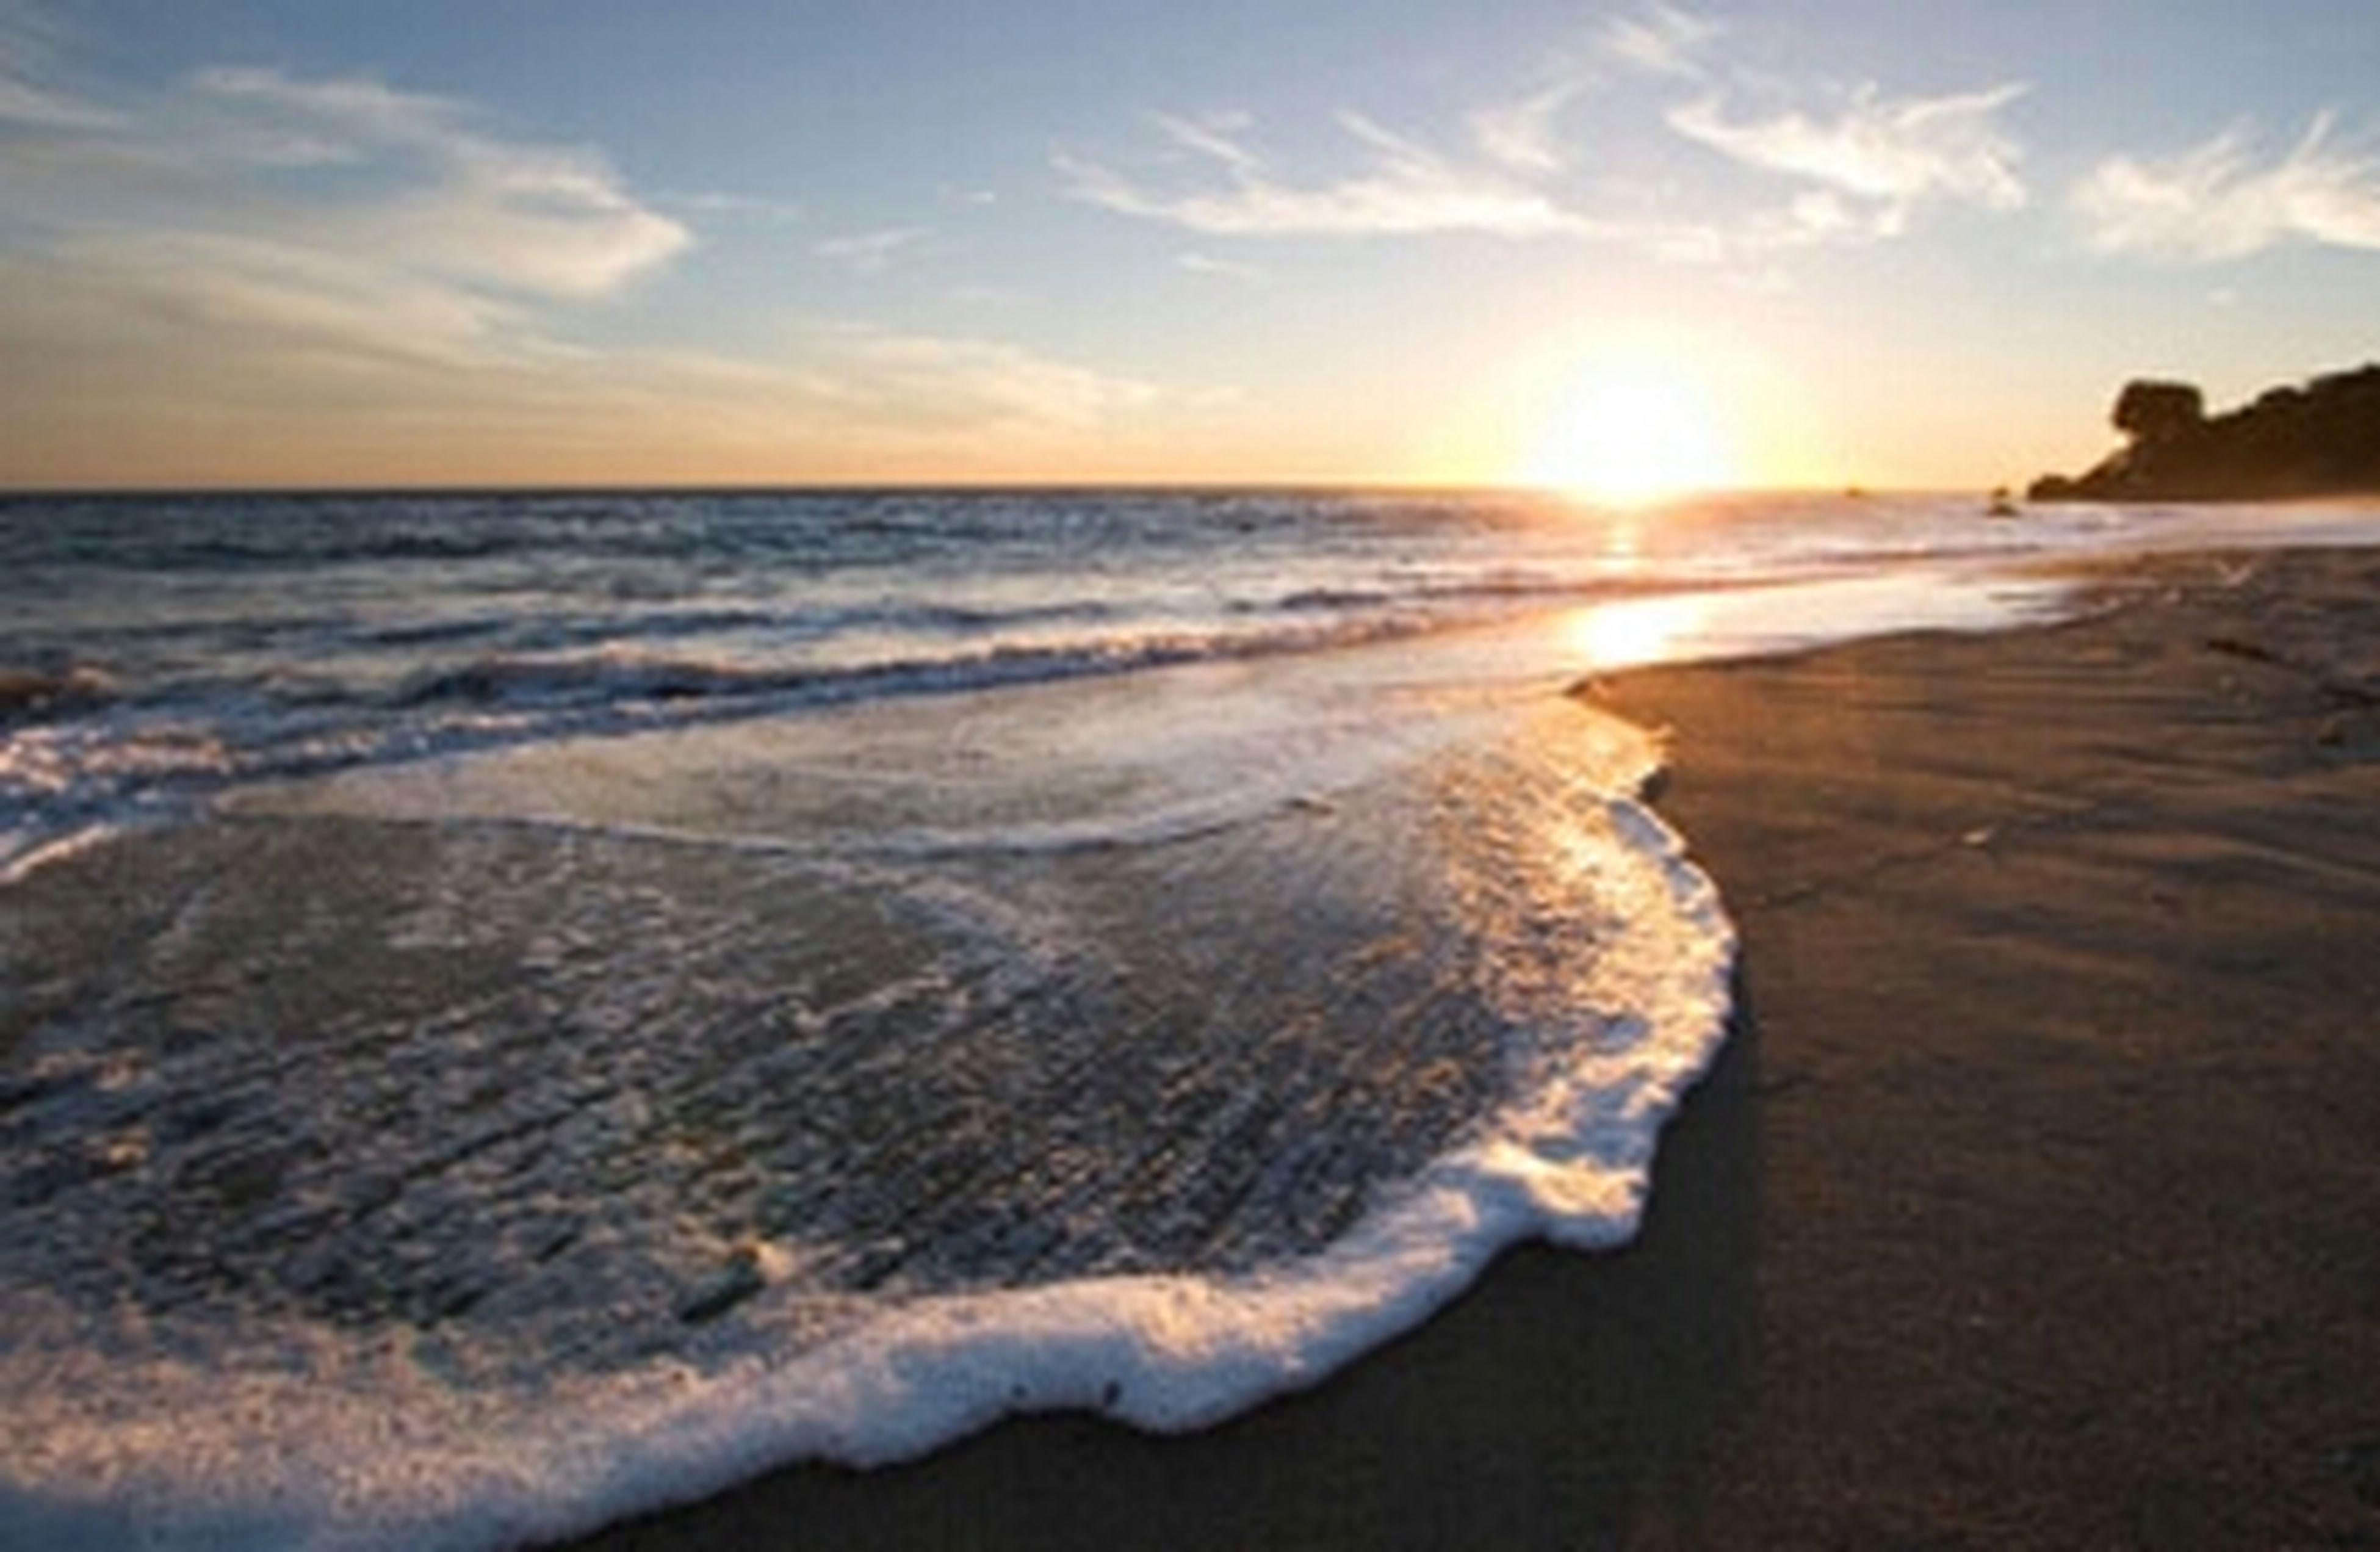 sea, water, beach, scenics, tranquil scene, horizon over water, sunset, beauty in nature, tranquility, sky, shore, sun, nature, wave, idyllic, reflection, sunlight, sand, cloud - sky, surf